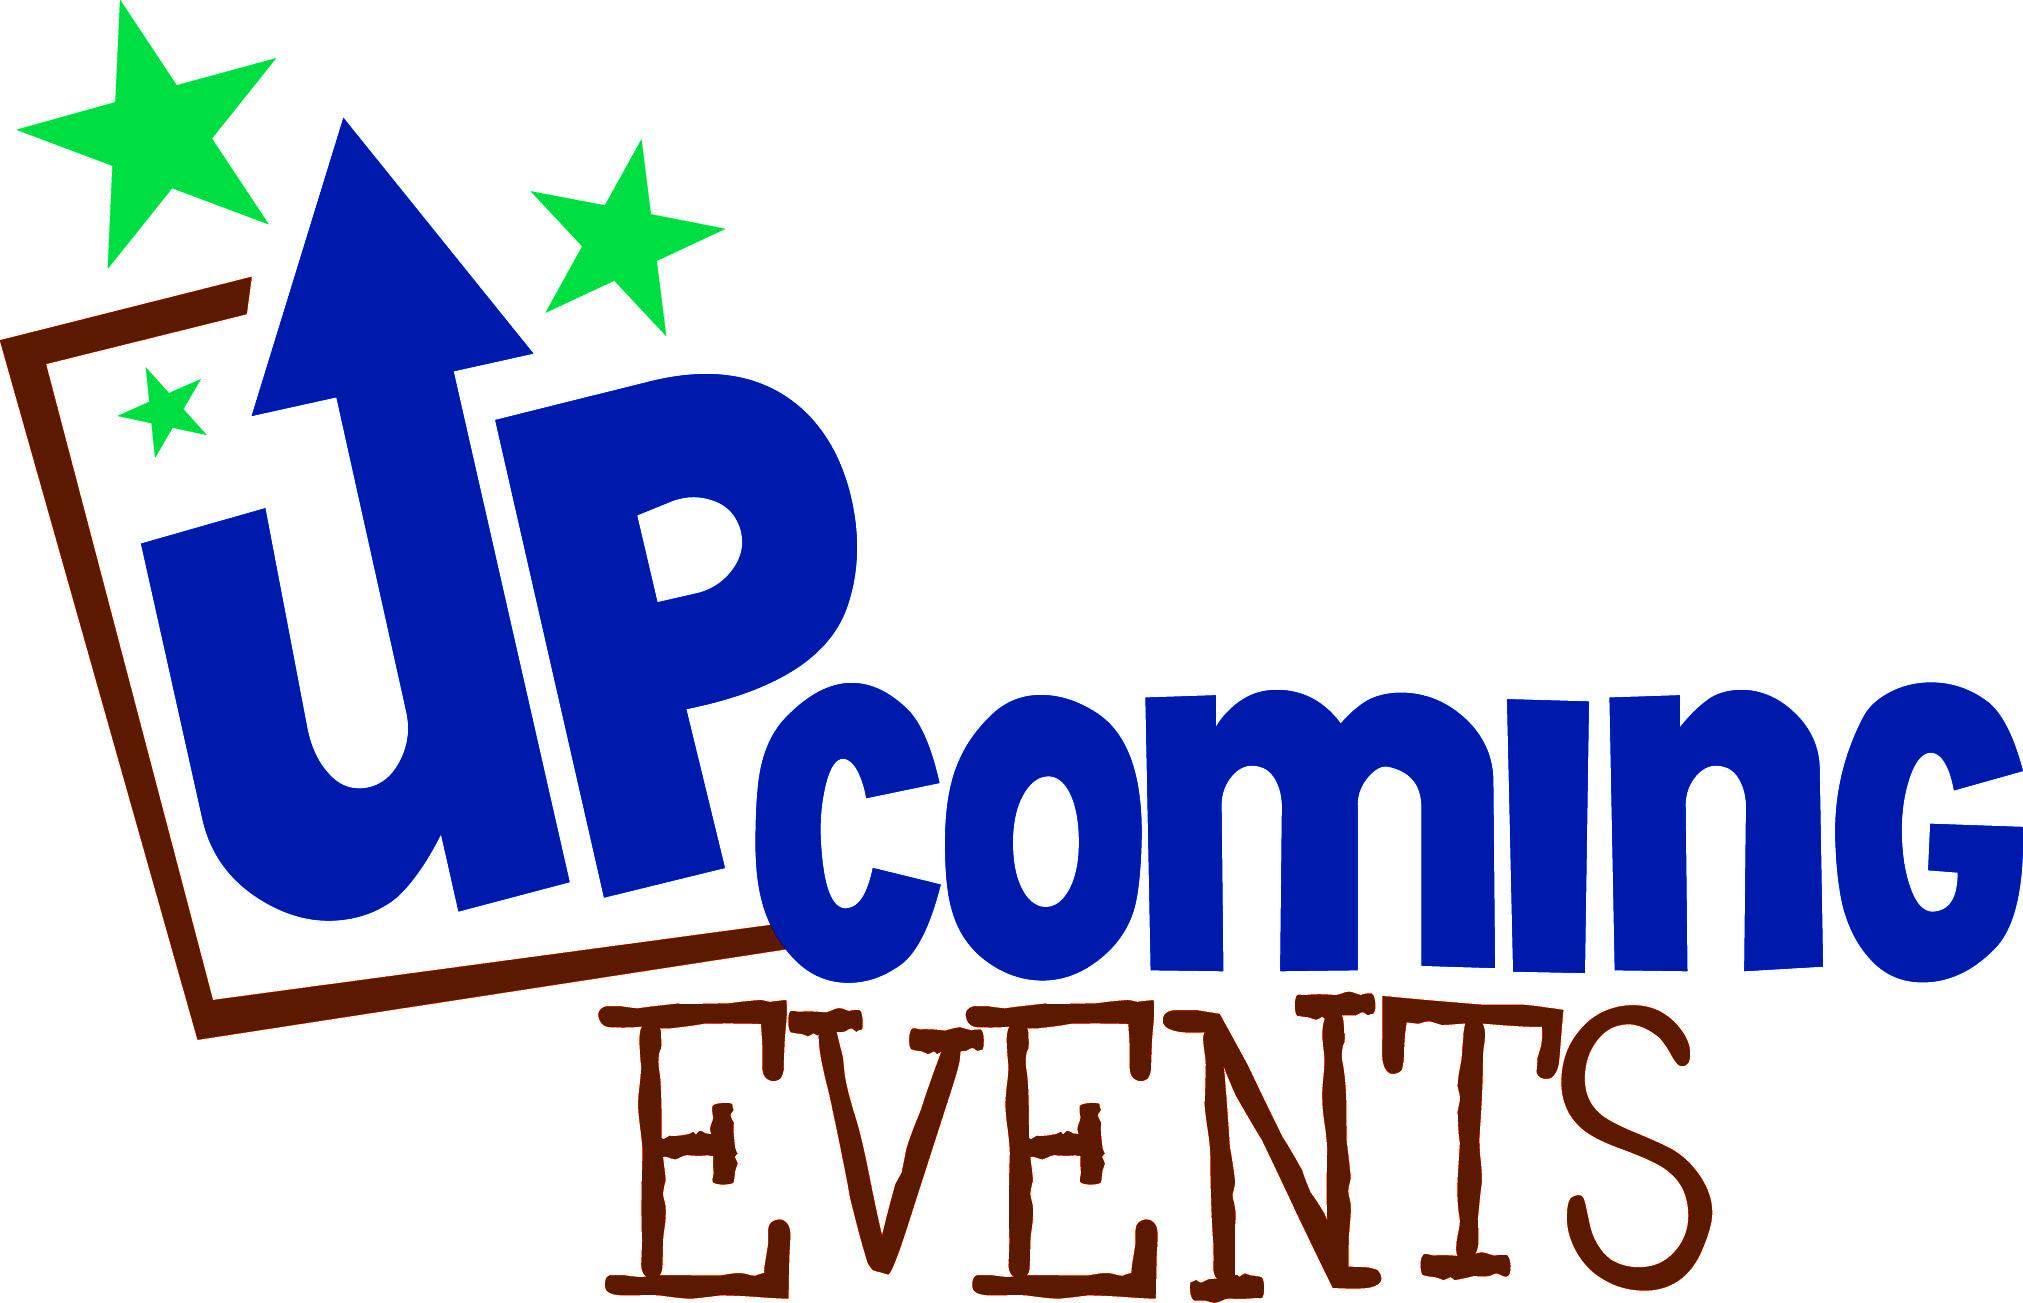 Upcoming Events Clip Art-upcoming events clip art-13